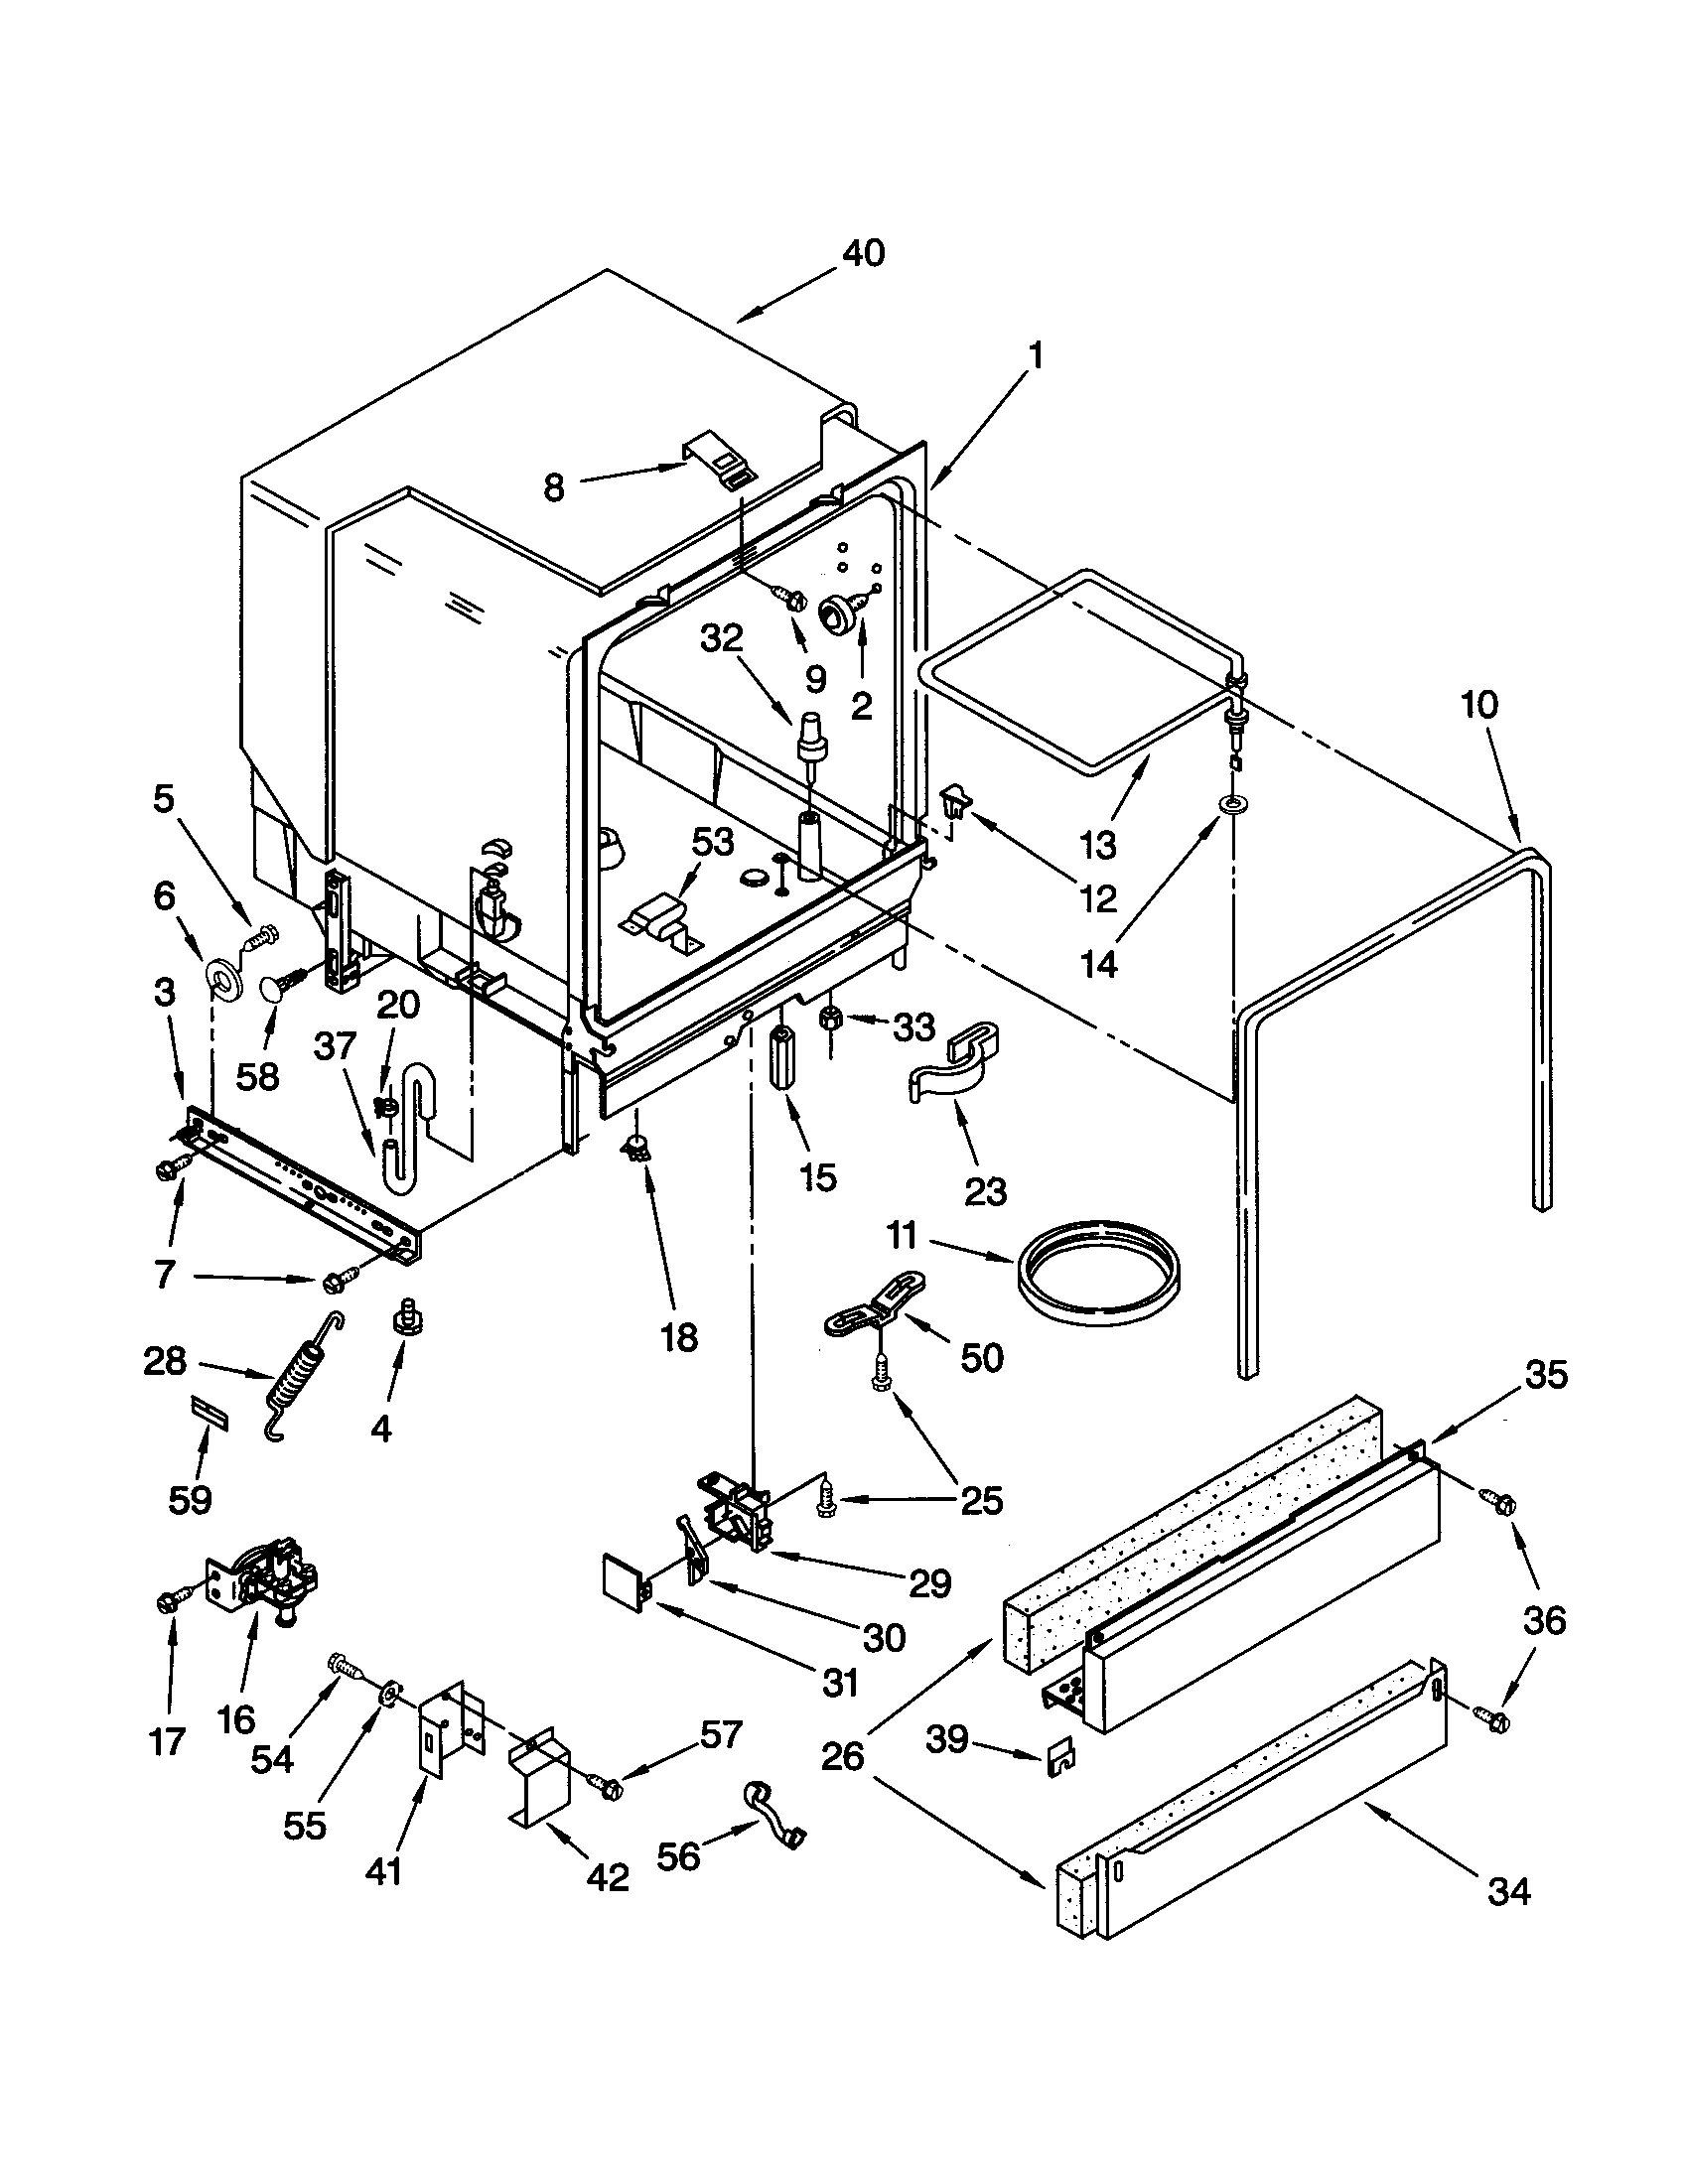 Whirlpool model GU940SCGB3 dishwasher genuine parts